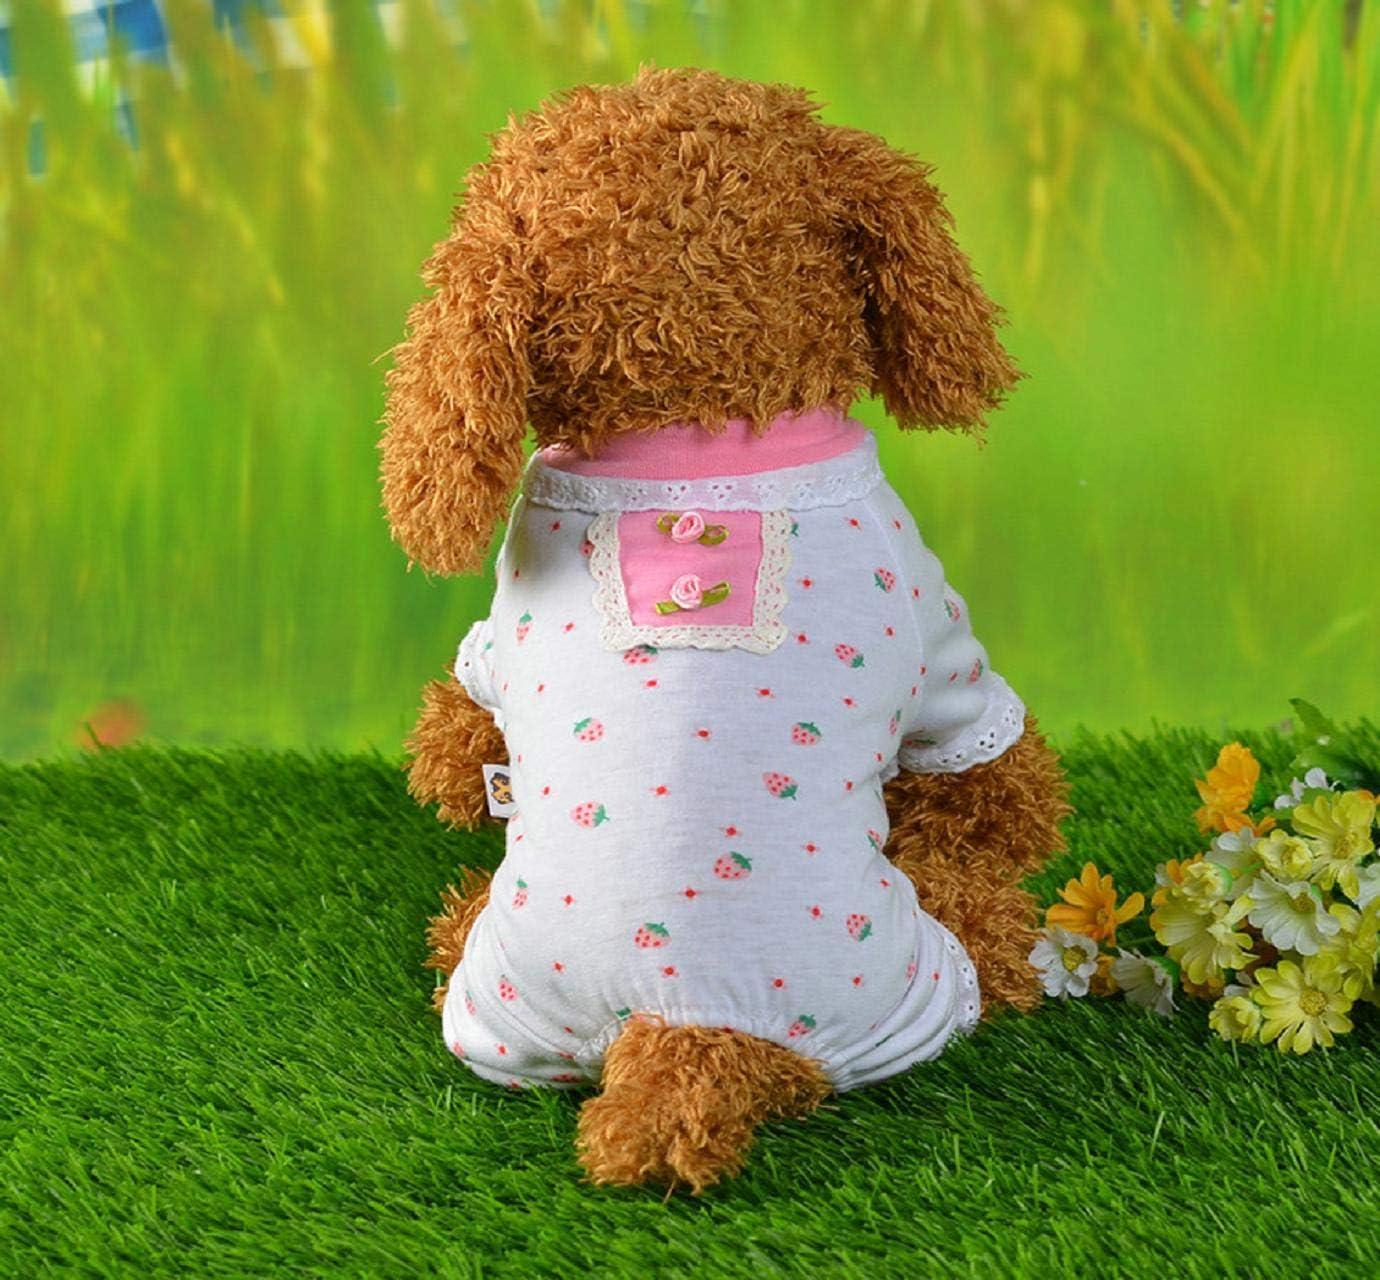 Unisex Floral Pet Clothes Puppy Dog Cat Vest Tracksuit Coat Dress Sweater Apparel Dogs Clothes Dog Dresses Dog Jumpsuit Barlingrock Dog Sweater for Small Dog Pet Clothes